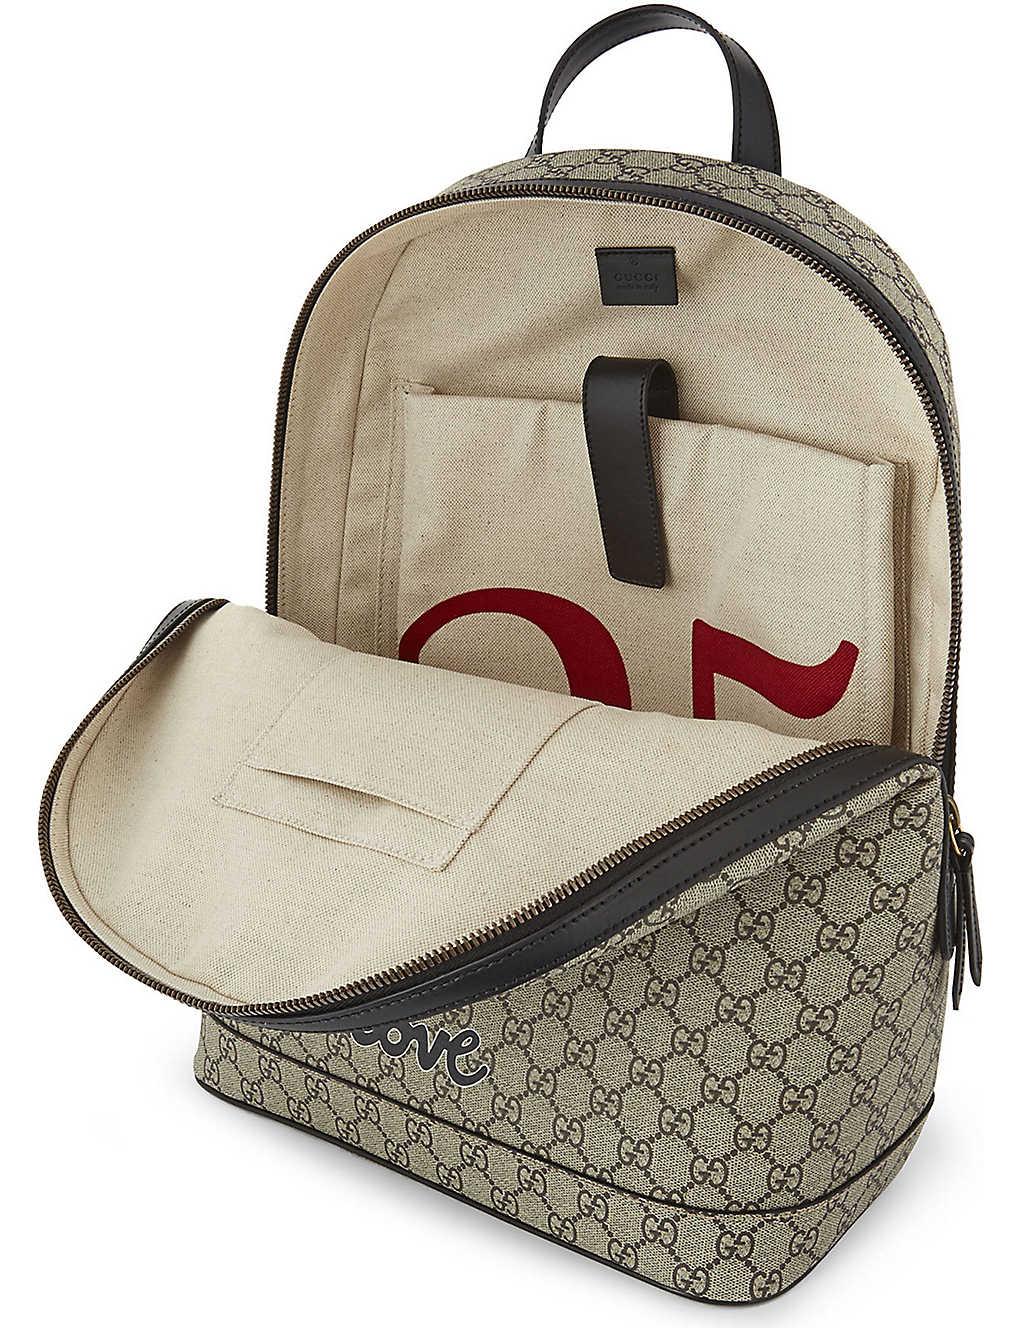 ce54e287225cd6 GUCCI - Bee print GG Supreme backpack | Selfridges.com